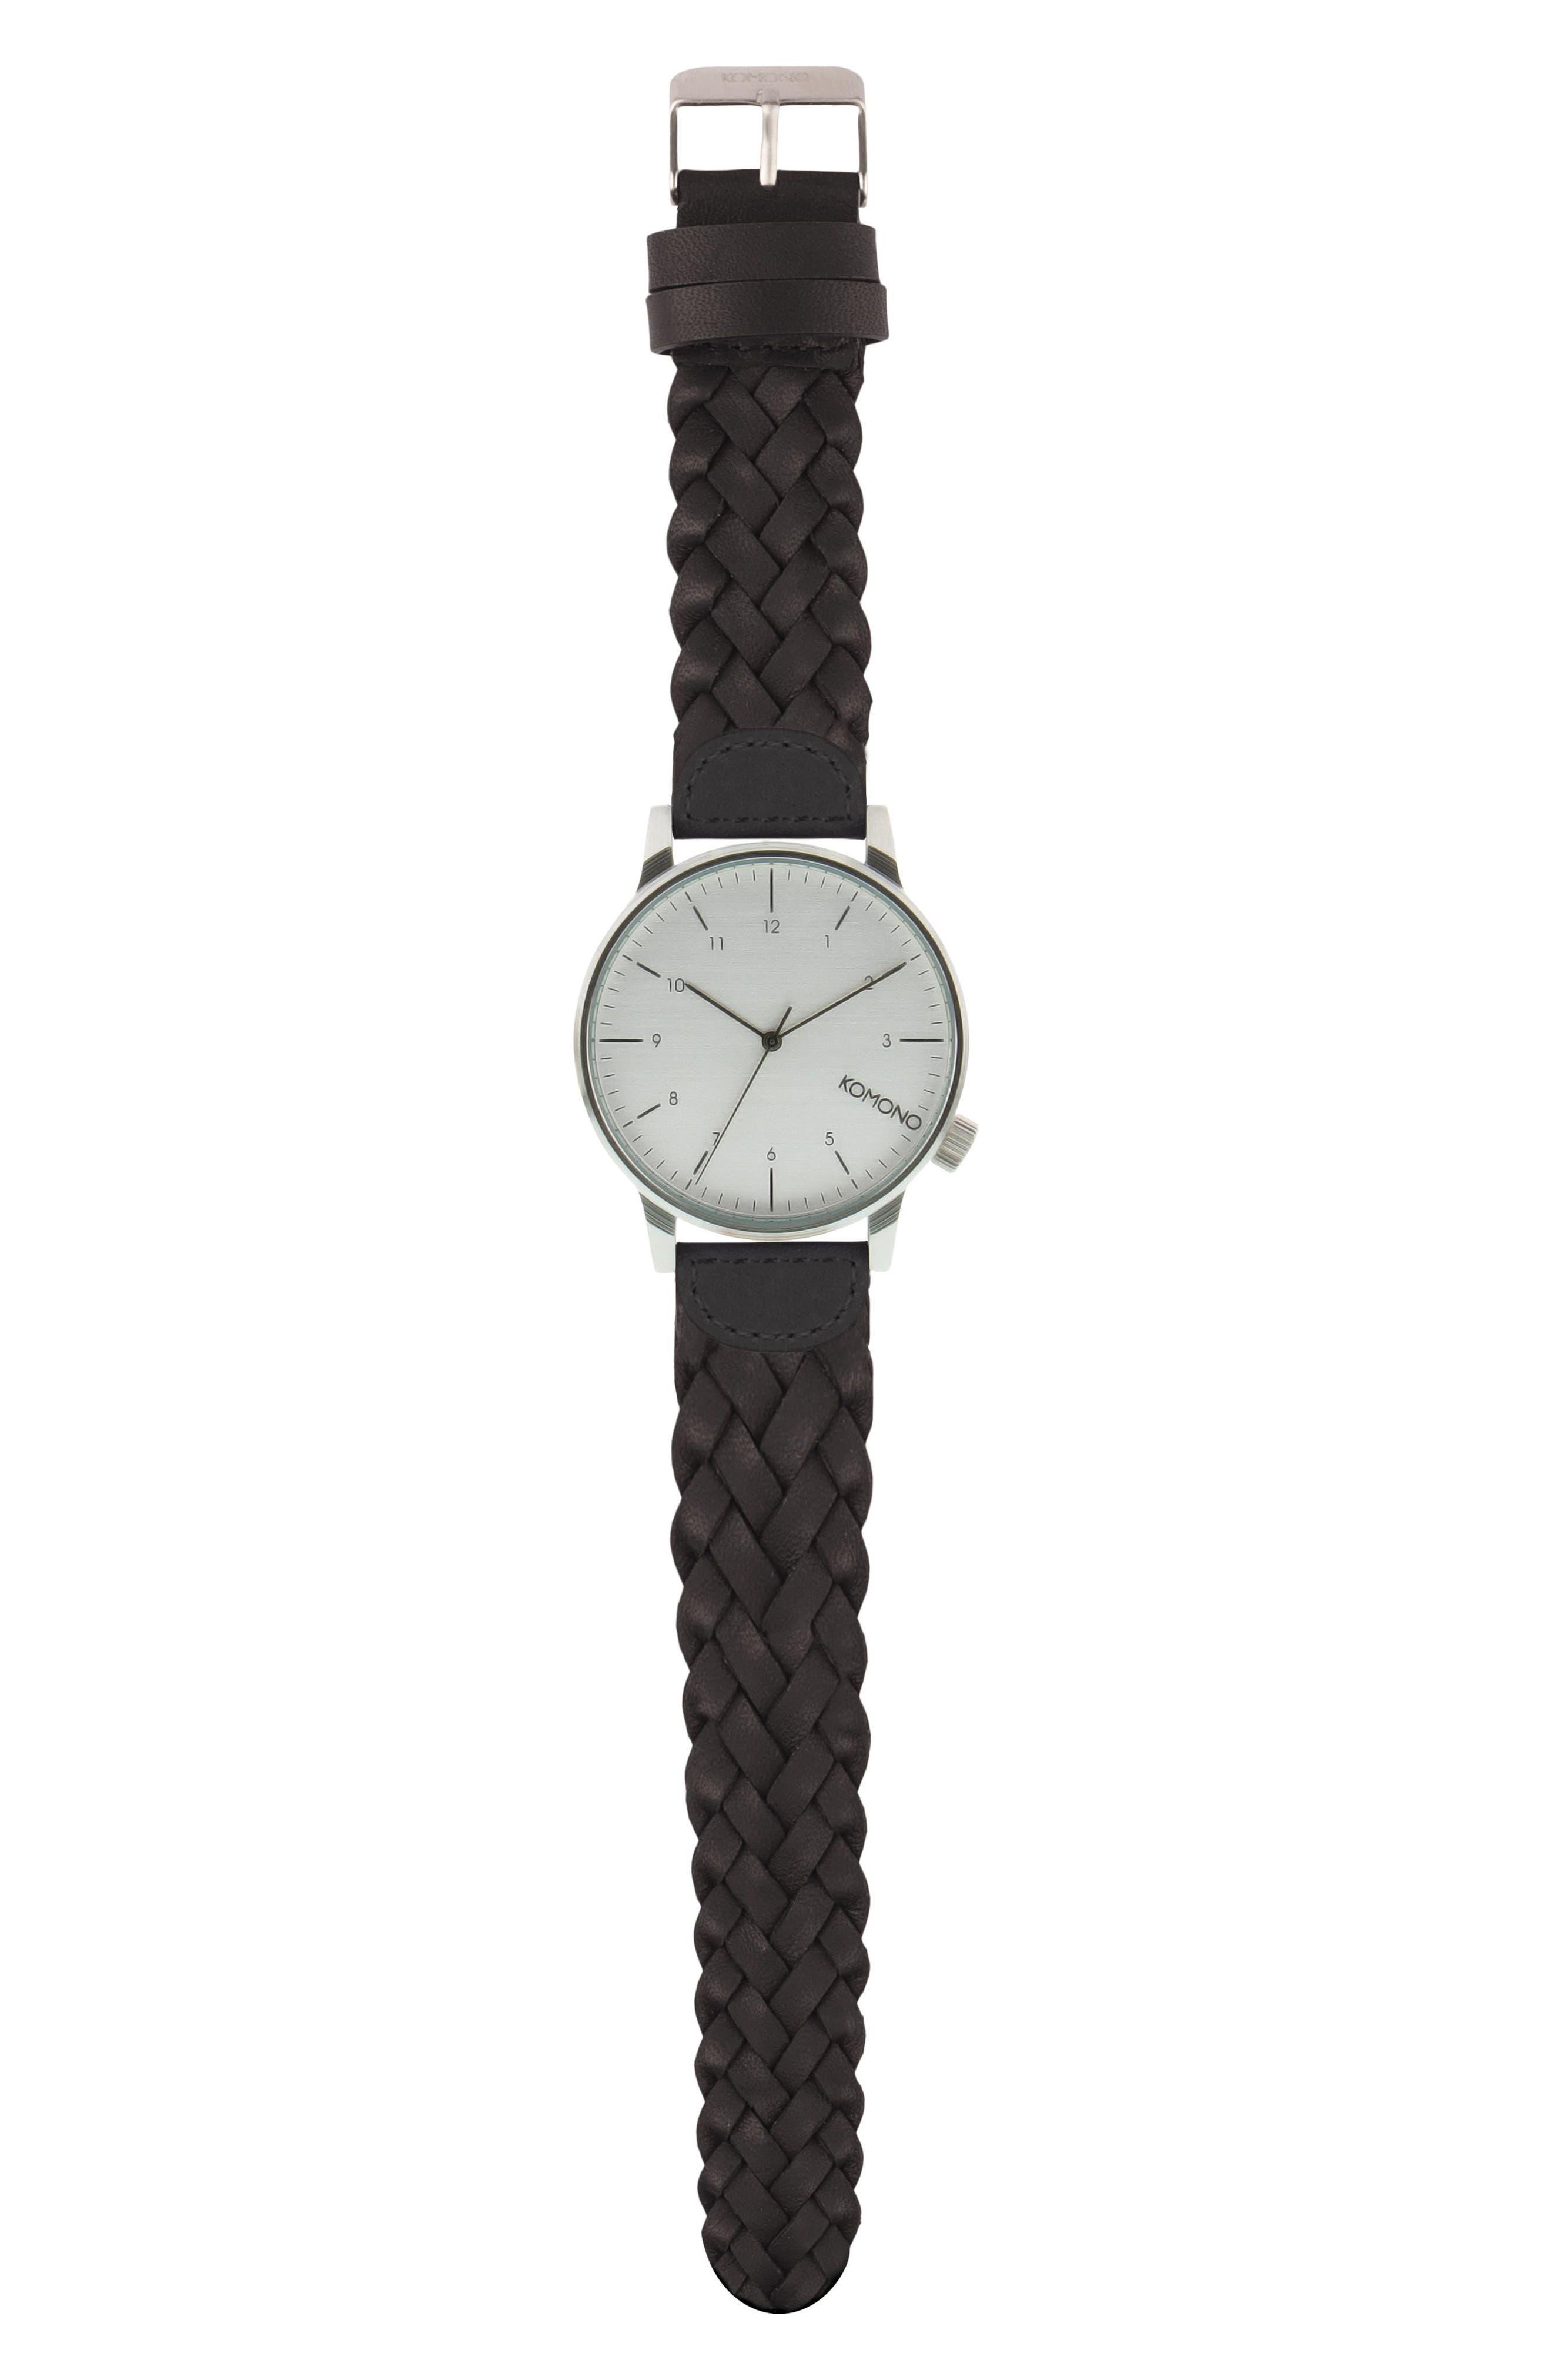 Alternate Image 1 Selected - Komono Winston Woven Leather Strap Watch, 41mm